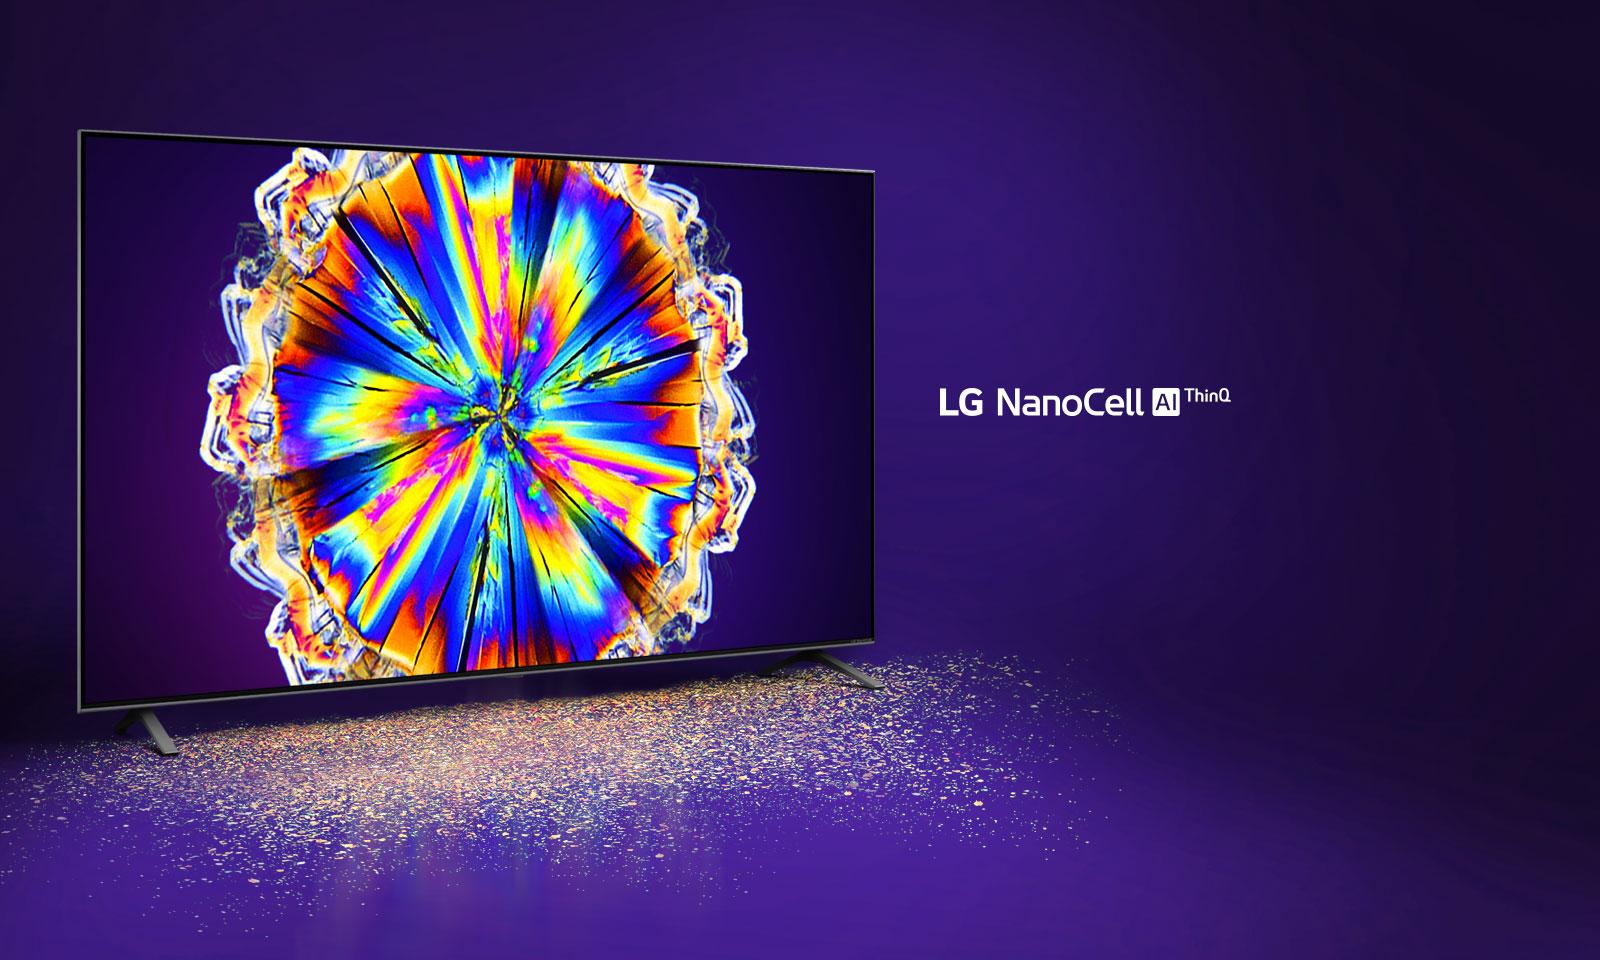 TV-NanoCell-4K-02-Hero-Desktop.jpg (1600×960)